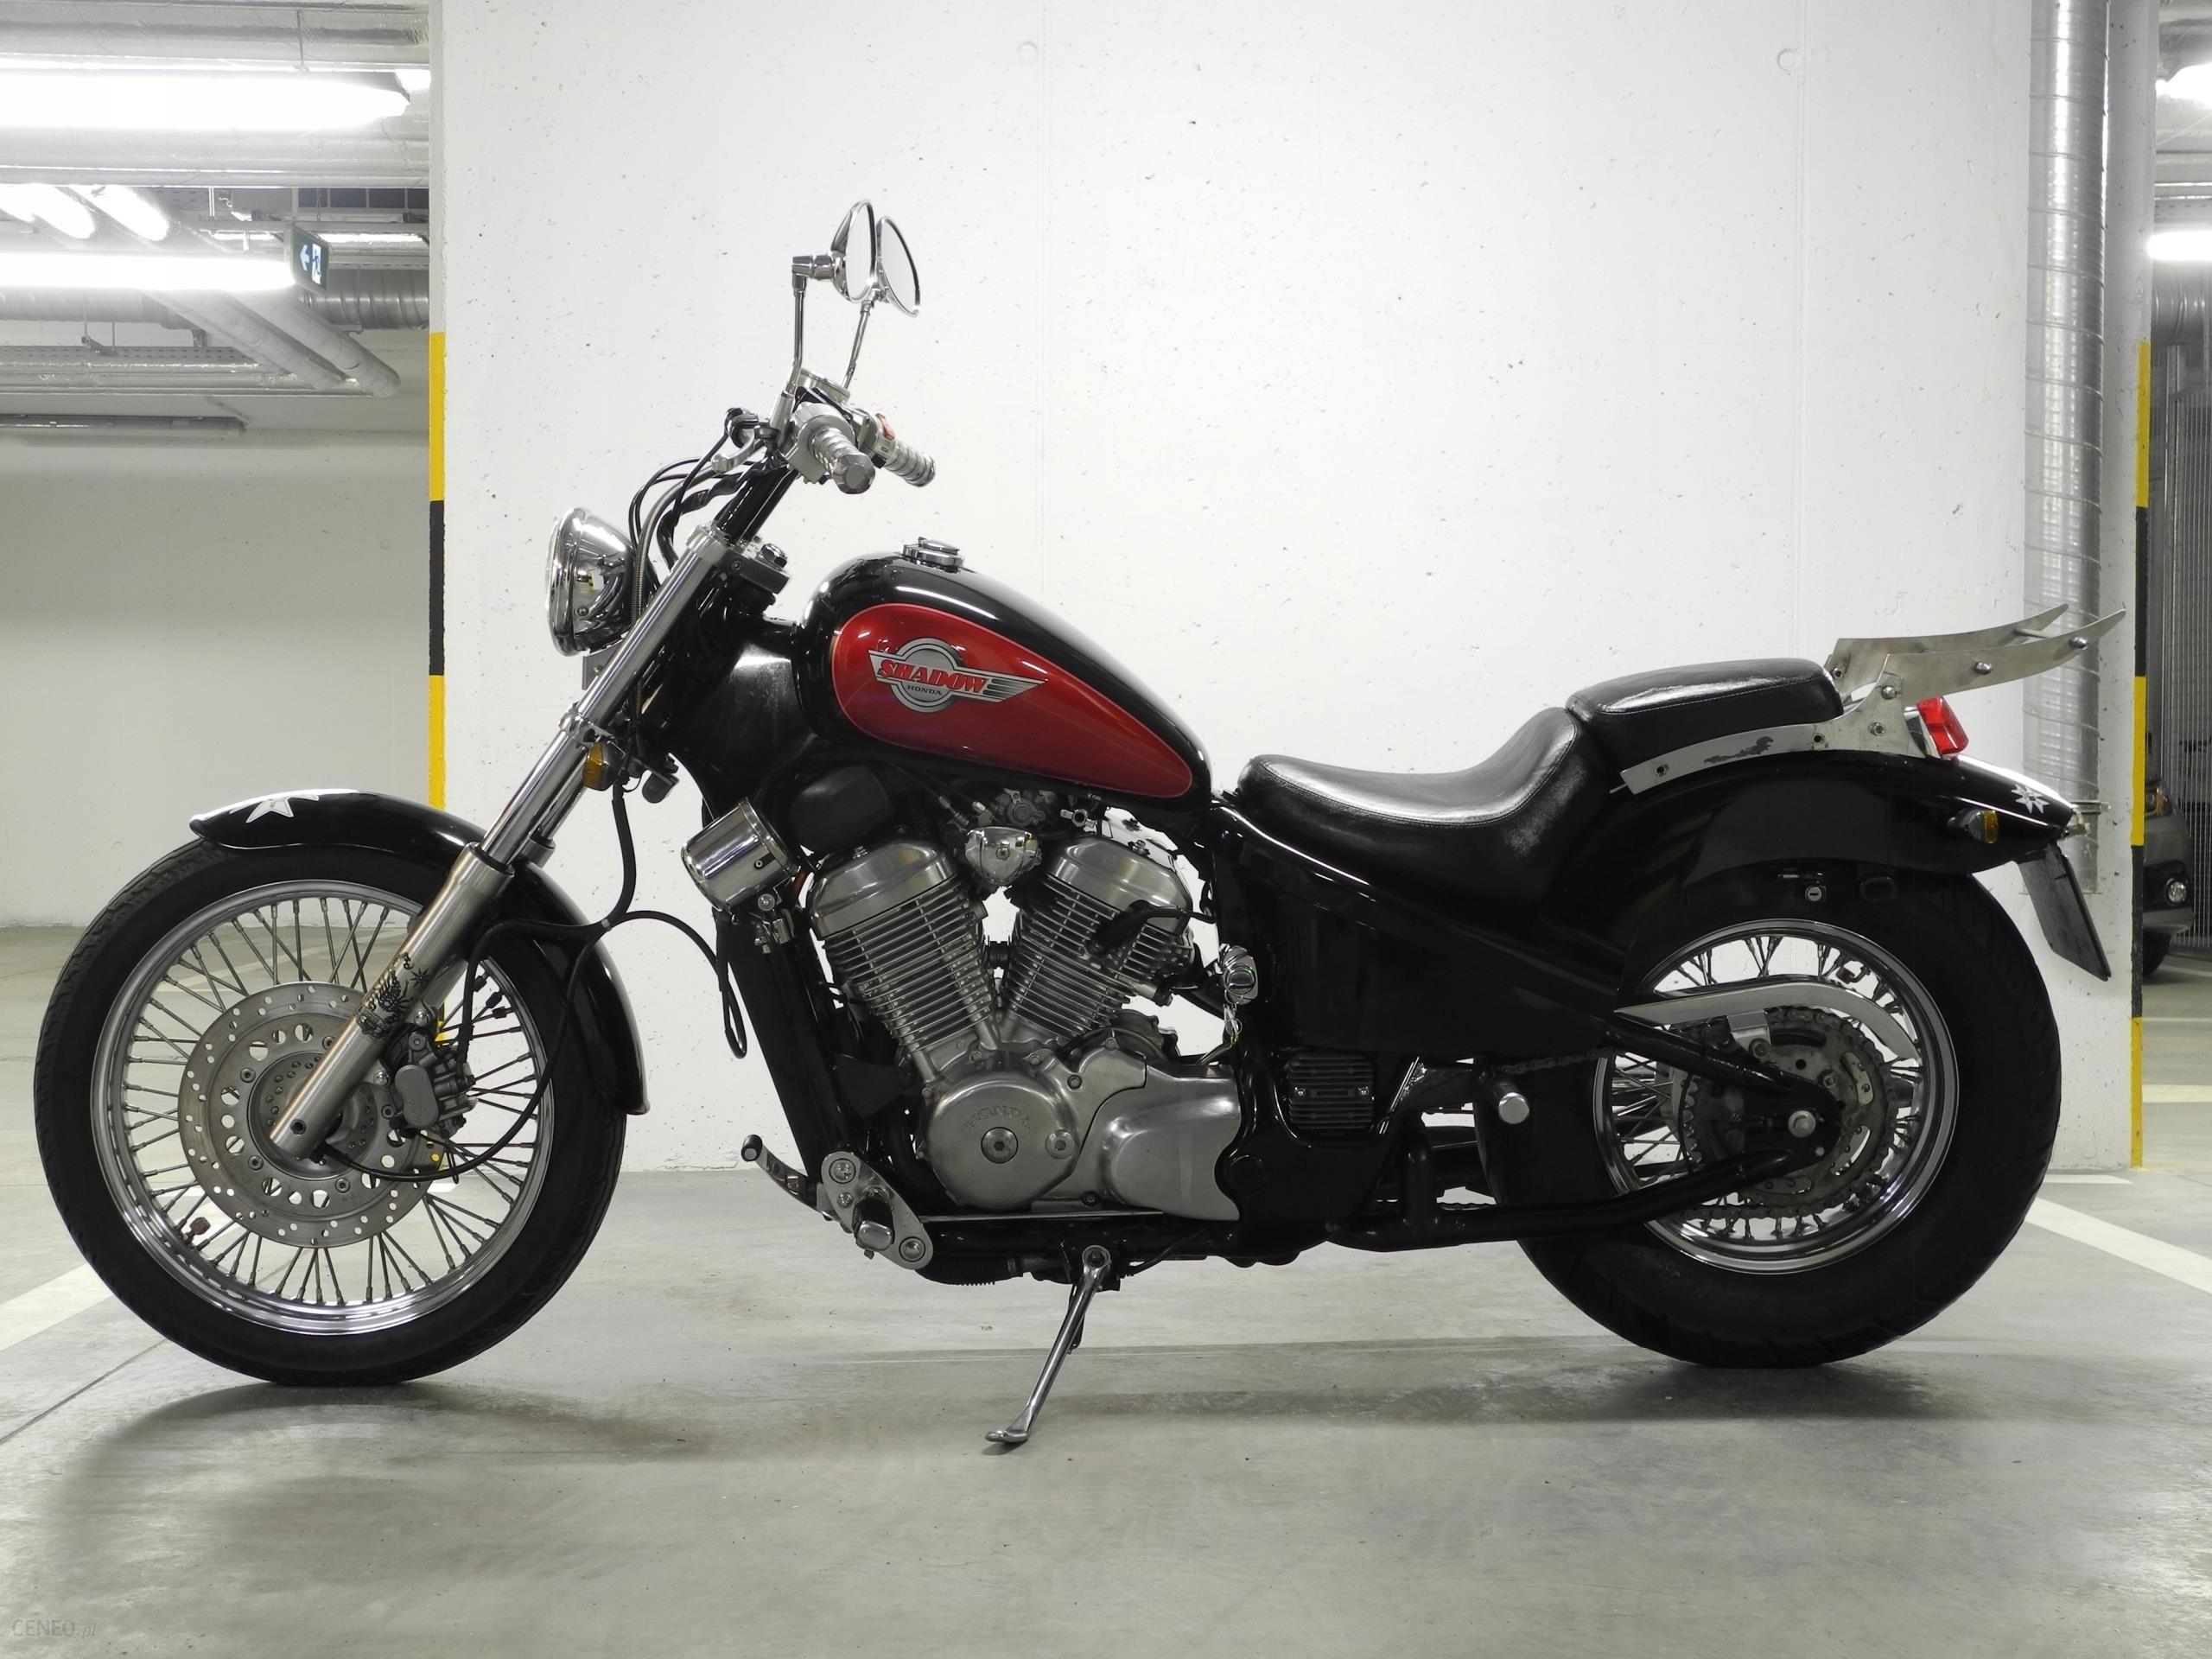 Chopper Turystyk Motocykl Honda Shadow 600 Opinie I Ceny Na Ceneo Pl